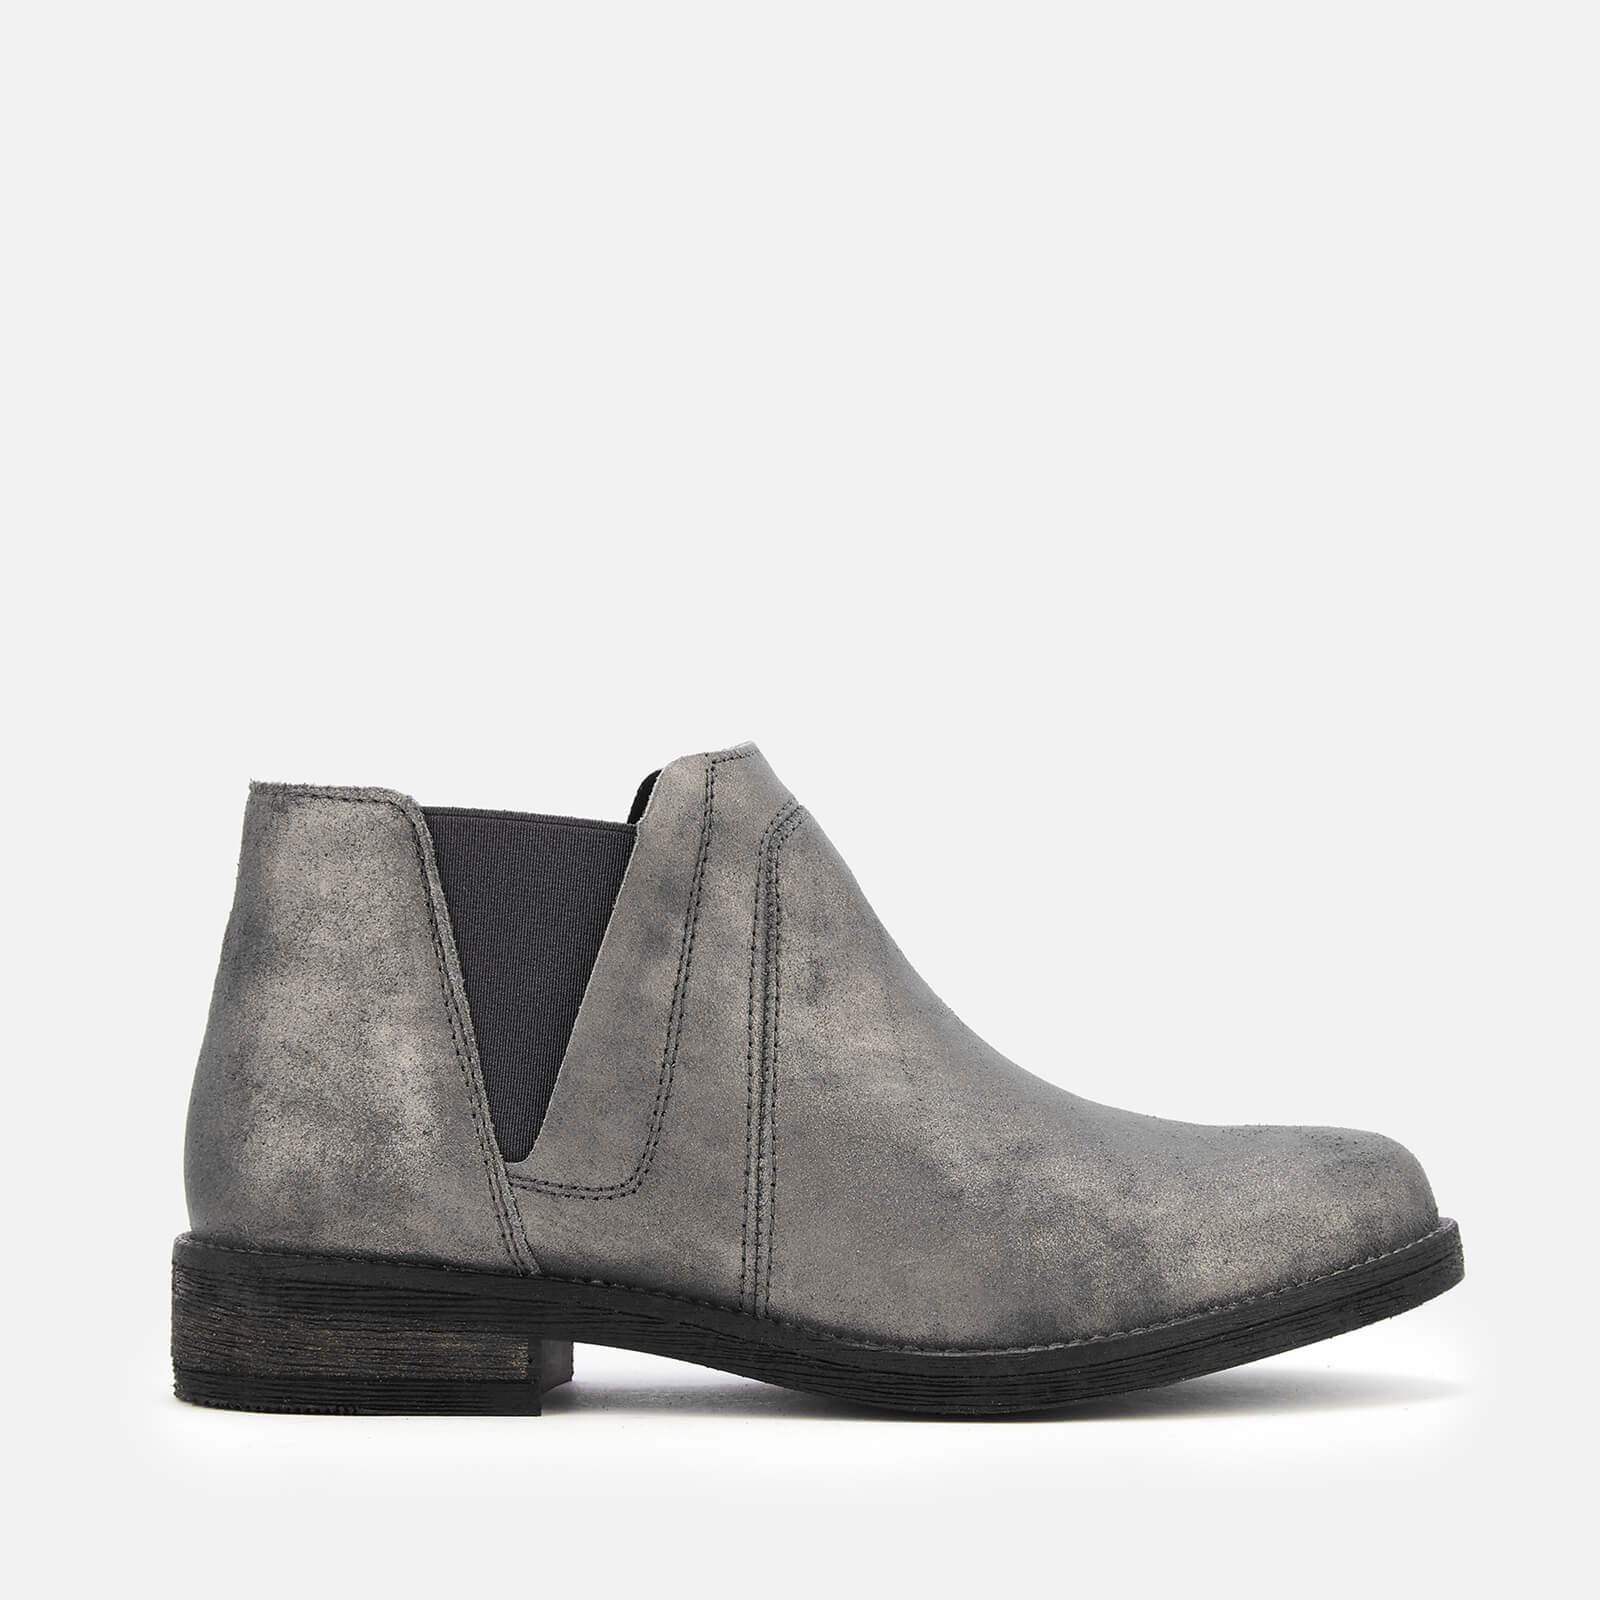 Clarks Women's Demi Beat Suede Ankle Boots - Dark Grey - UK 5 - Grey